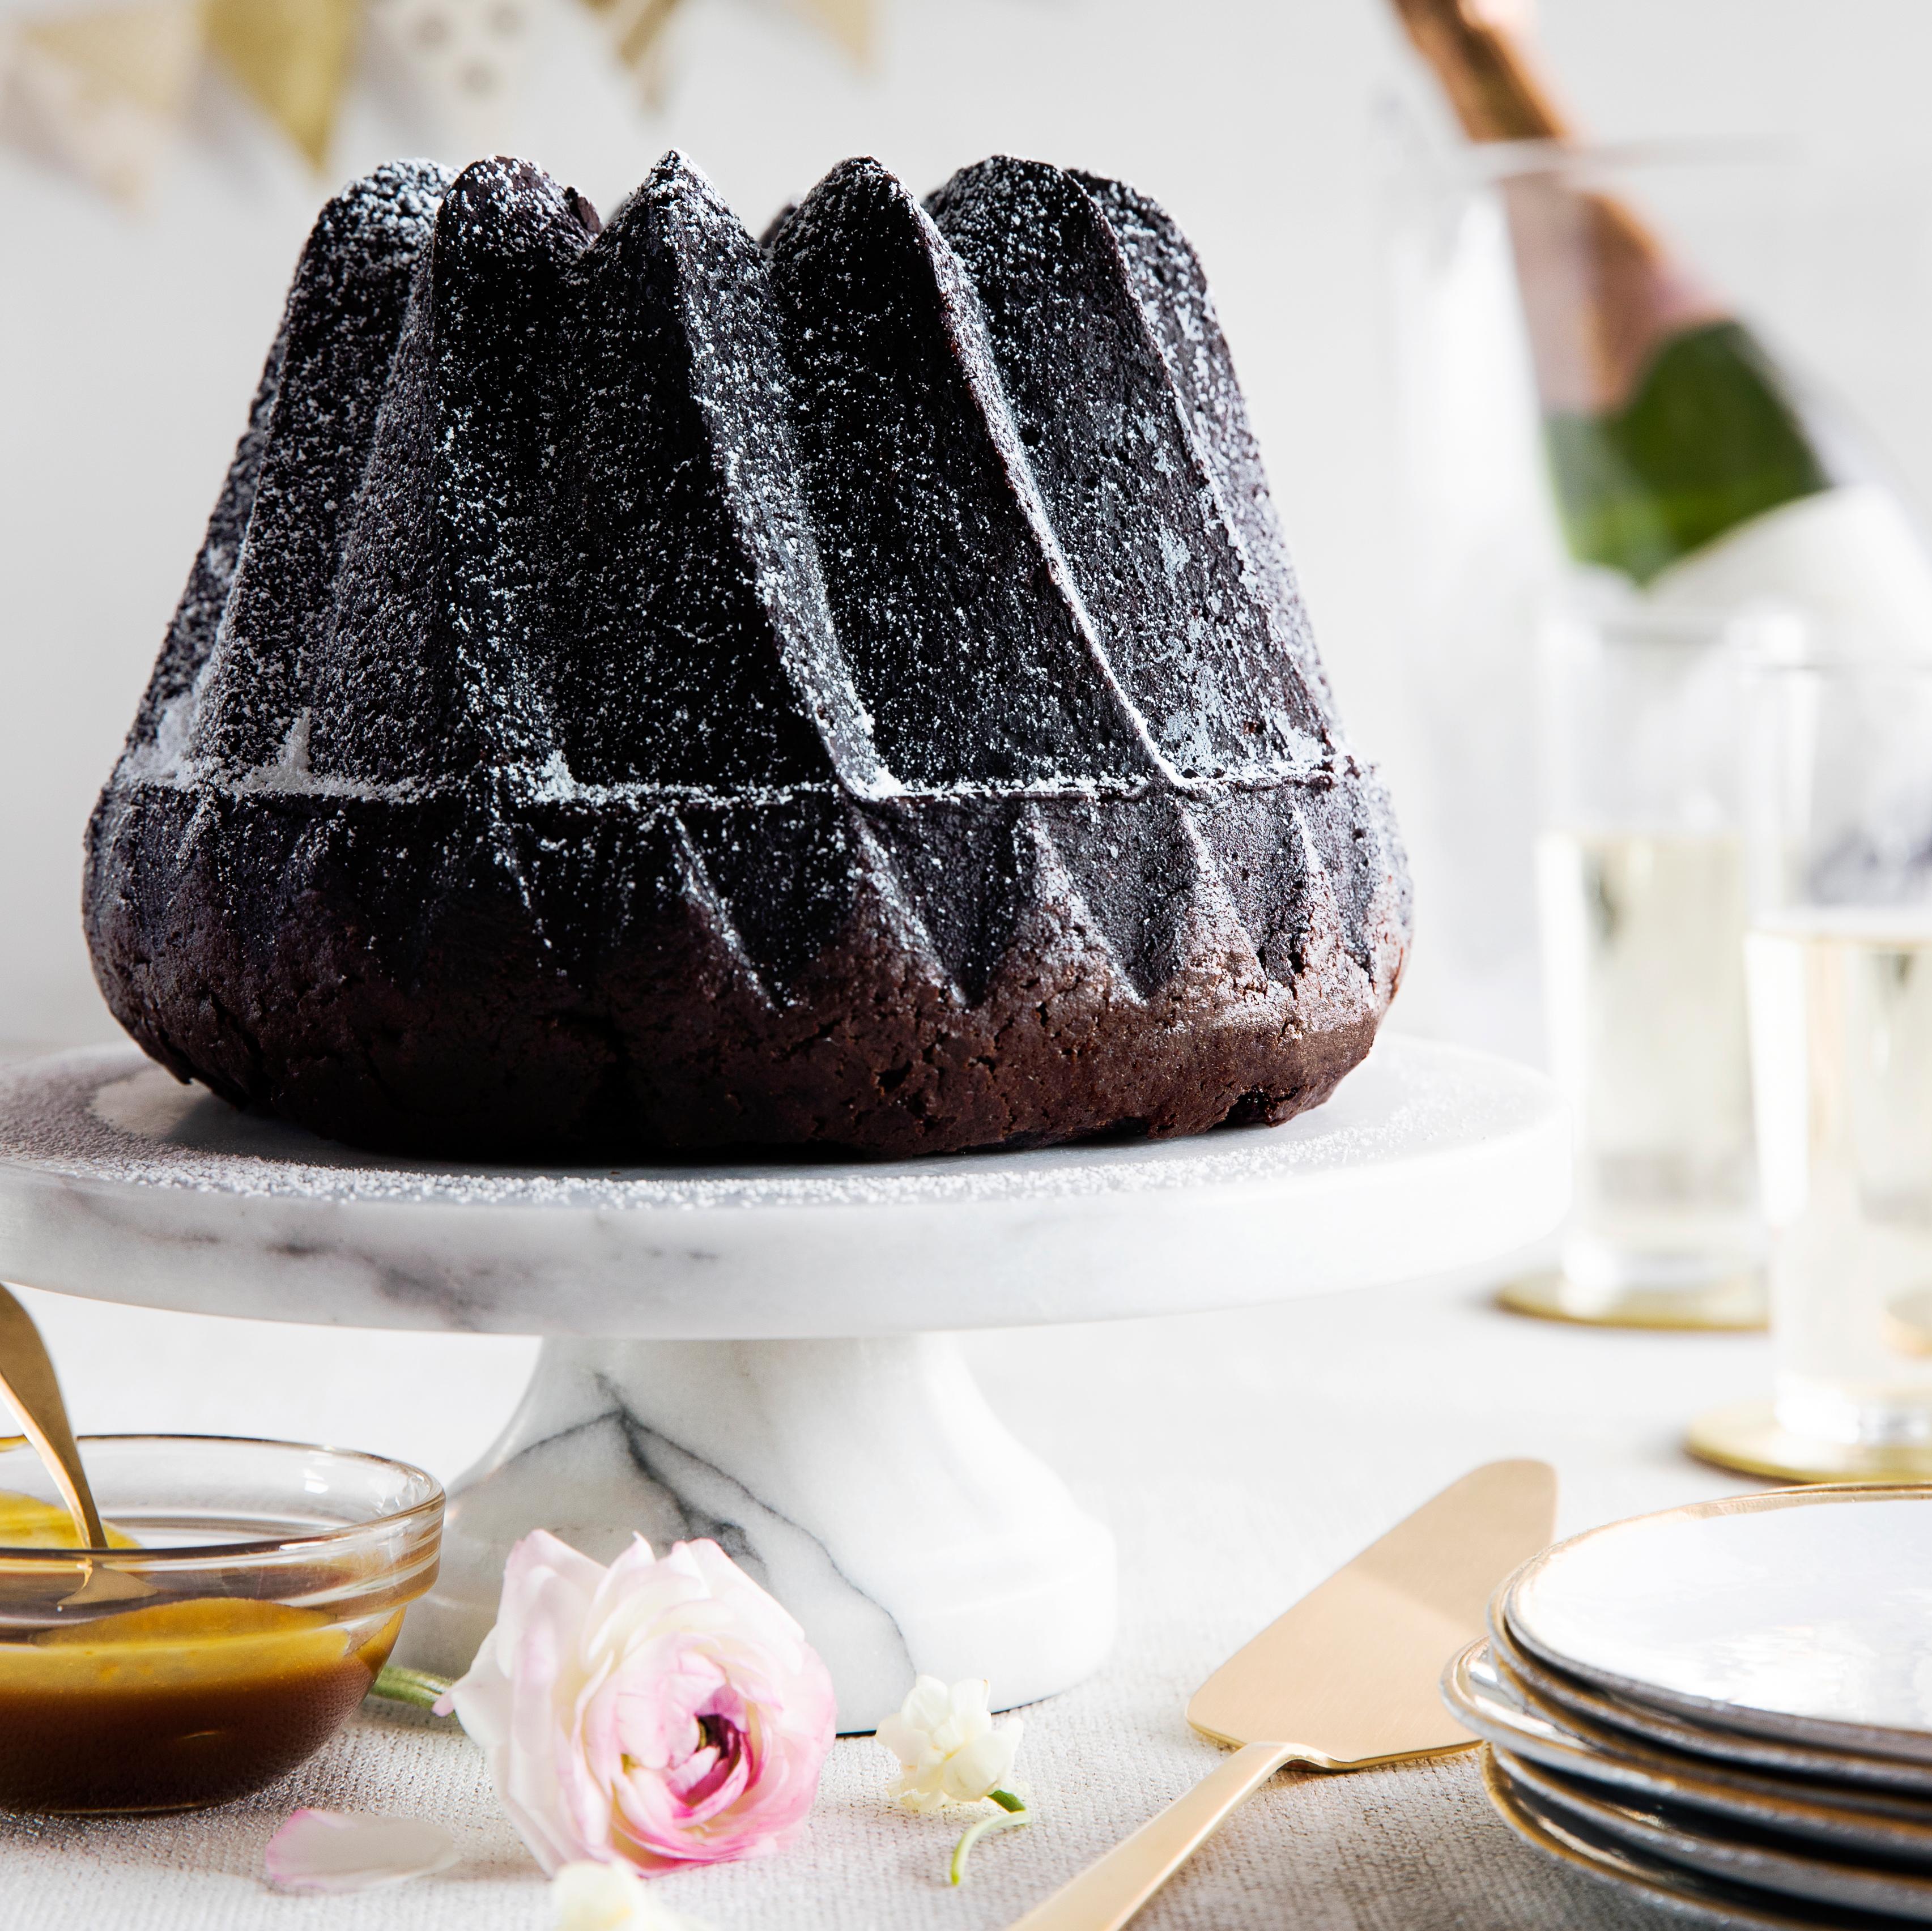 su-Dark Chocolate Bundt Cake with Whiskey Caramel Sauce